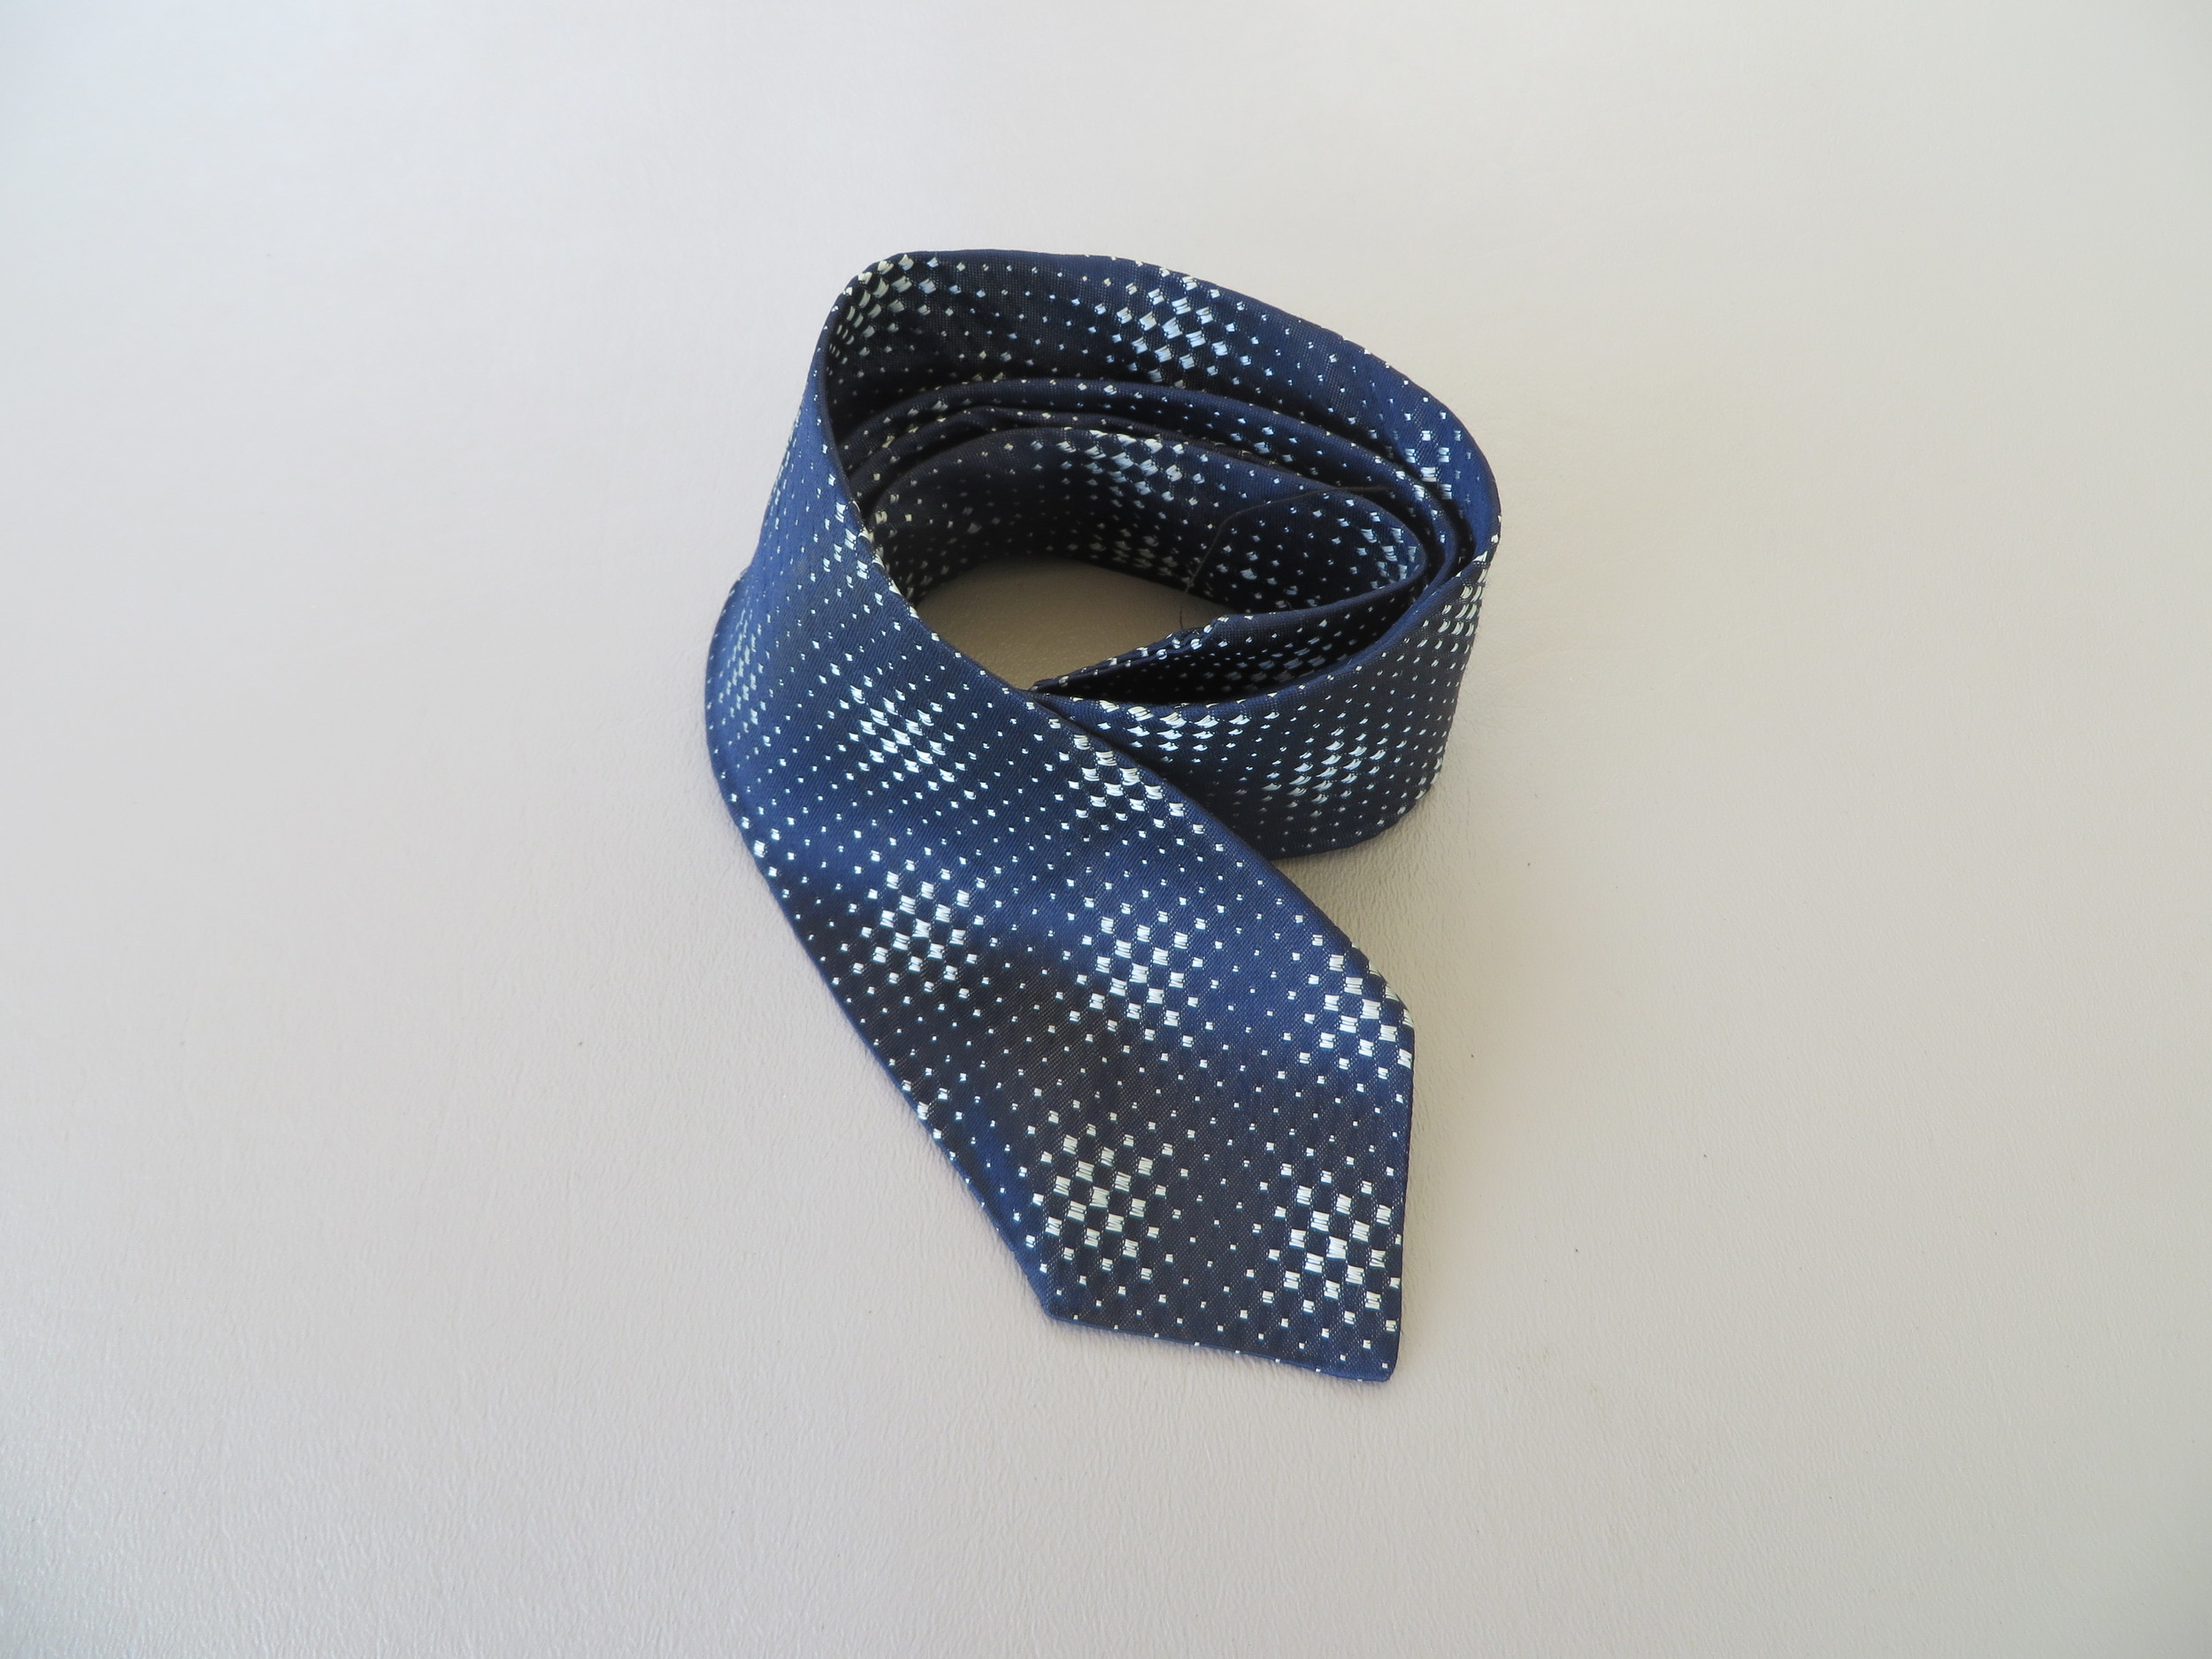 Men's 1950's-1960's blue & silver geometric necktie